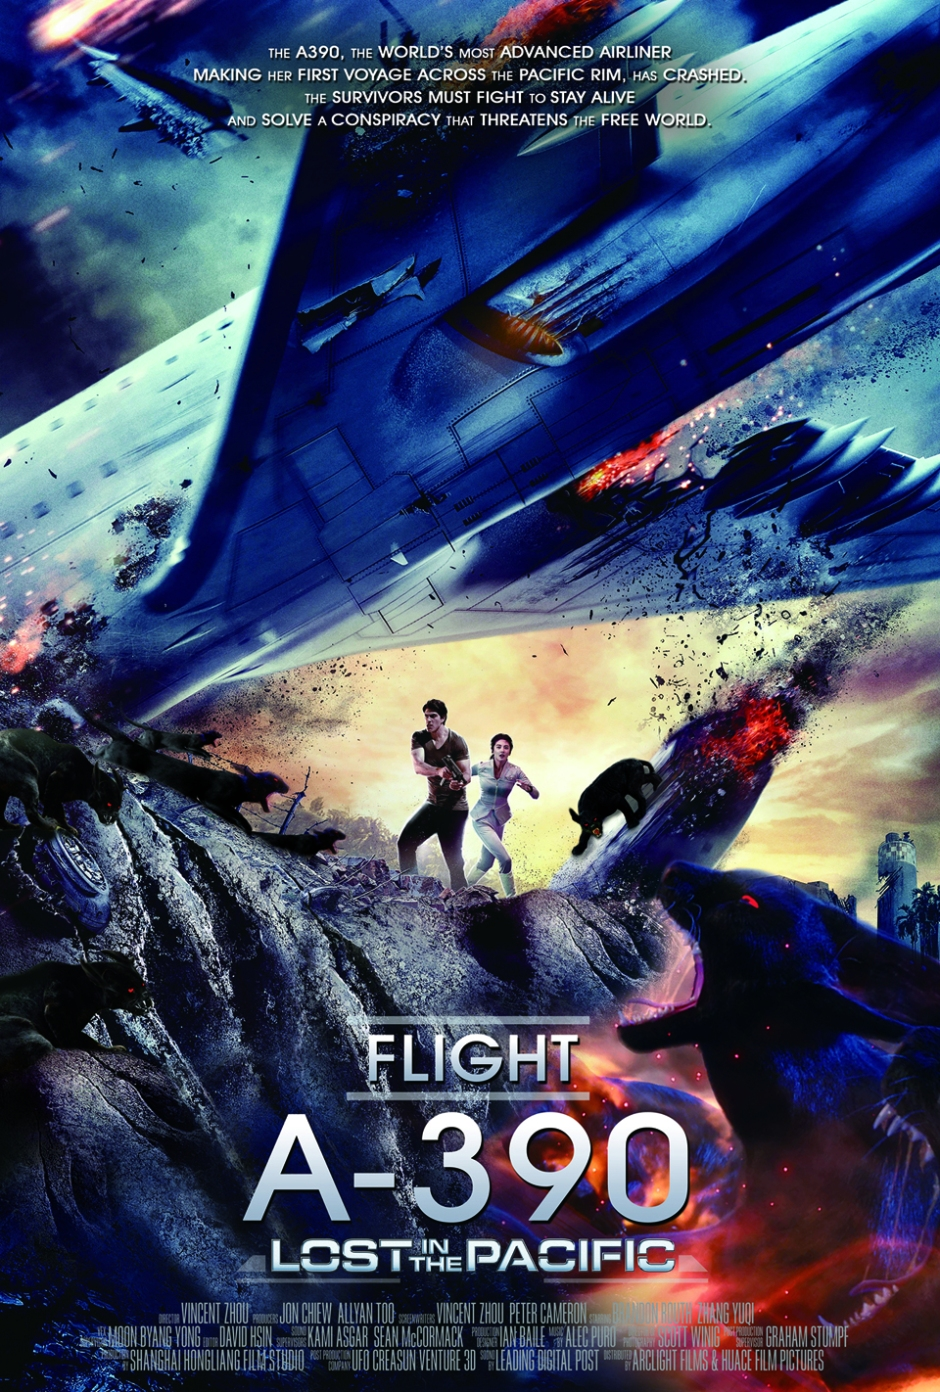 Cinema Bravo LOST IN THE PACIFIC poster